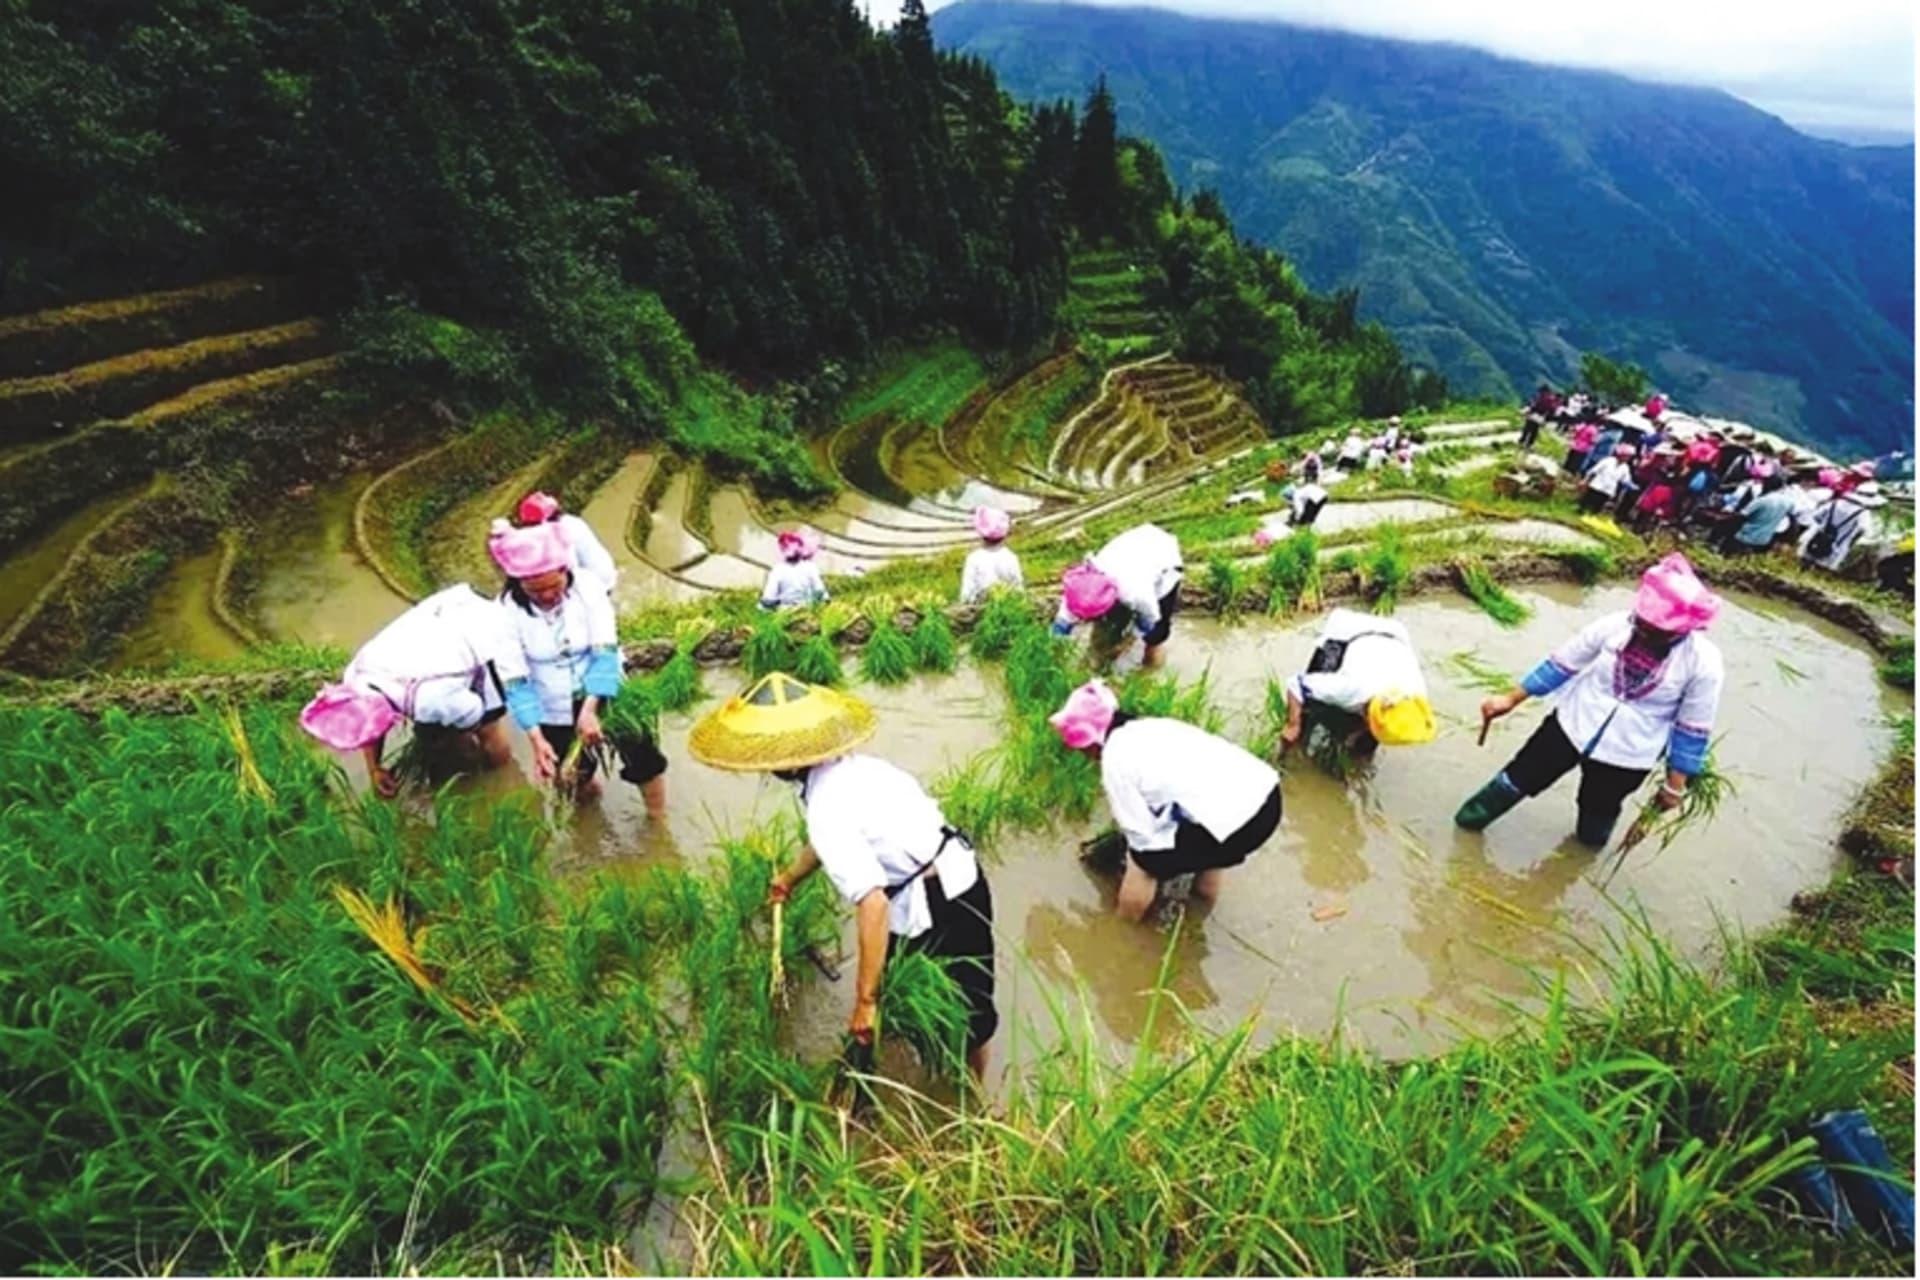 Guilin - Dragon Boat Festival 2021: Rice Seedlings Planting